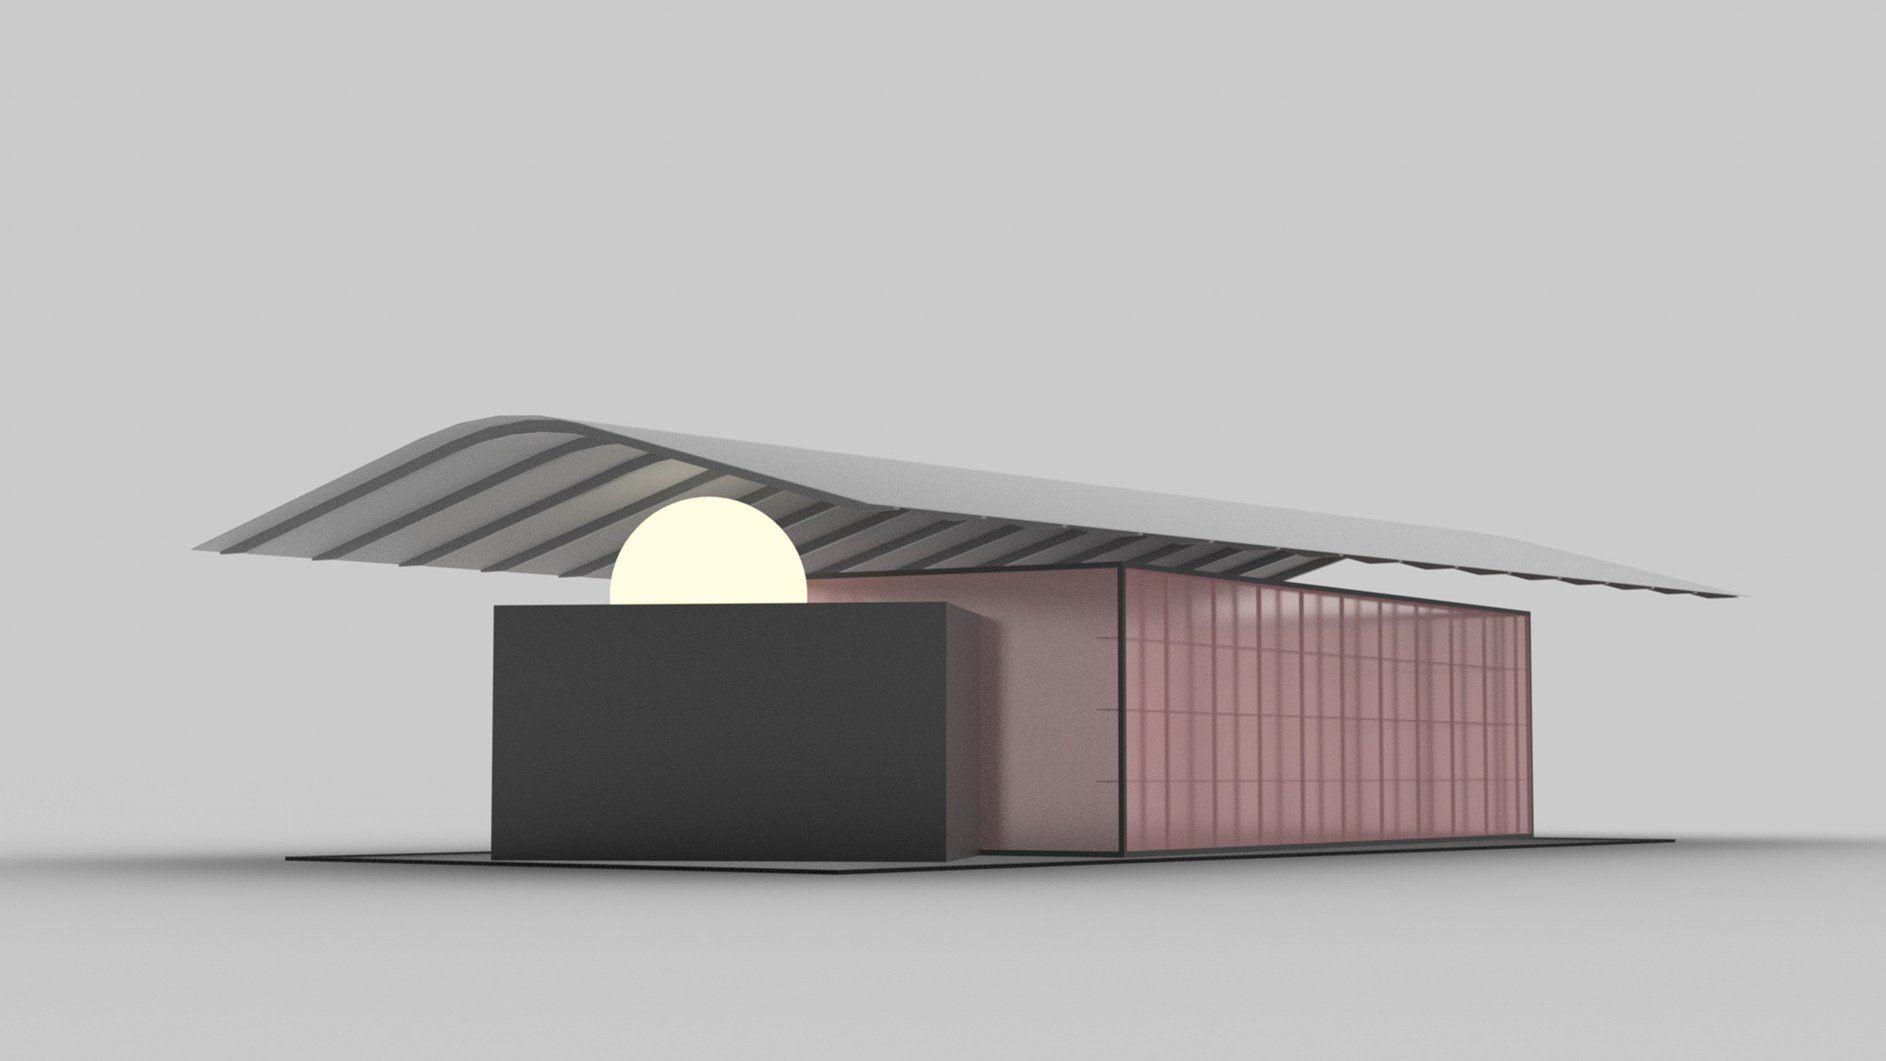 Das Haus – Interiors on Stage 2017